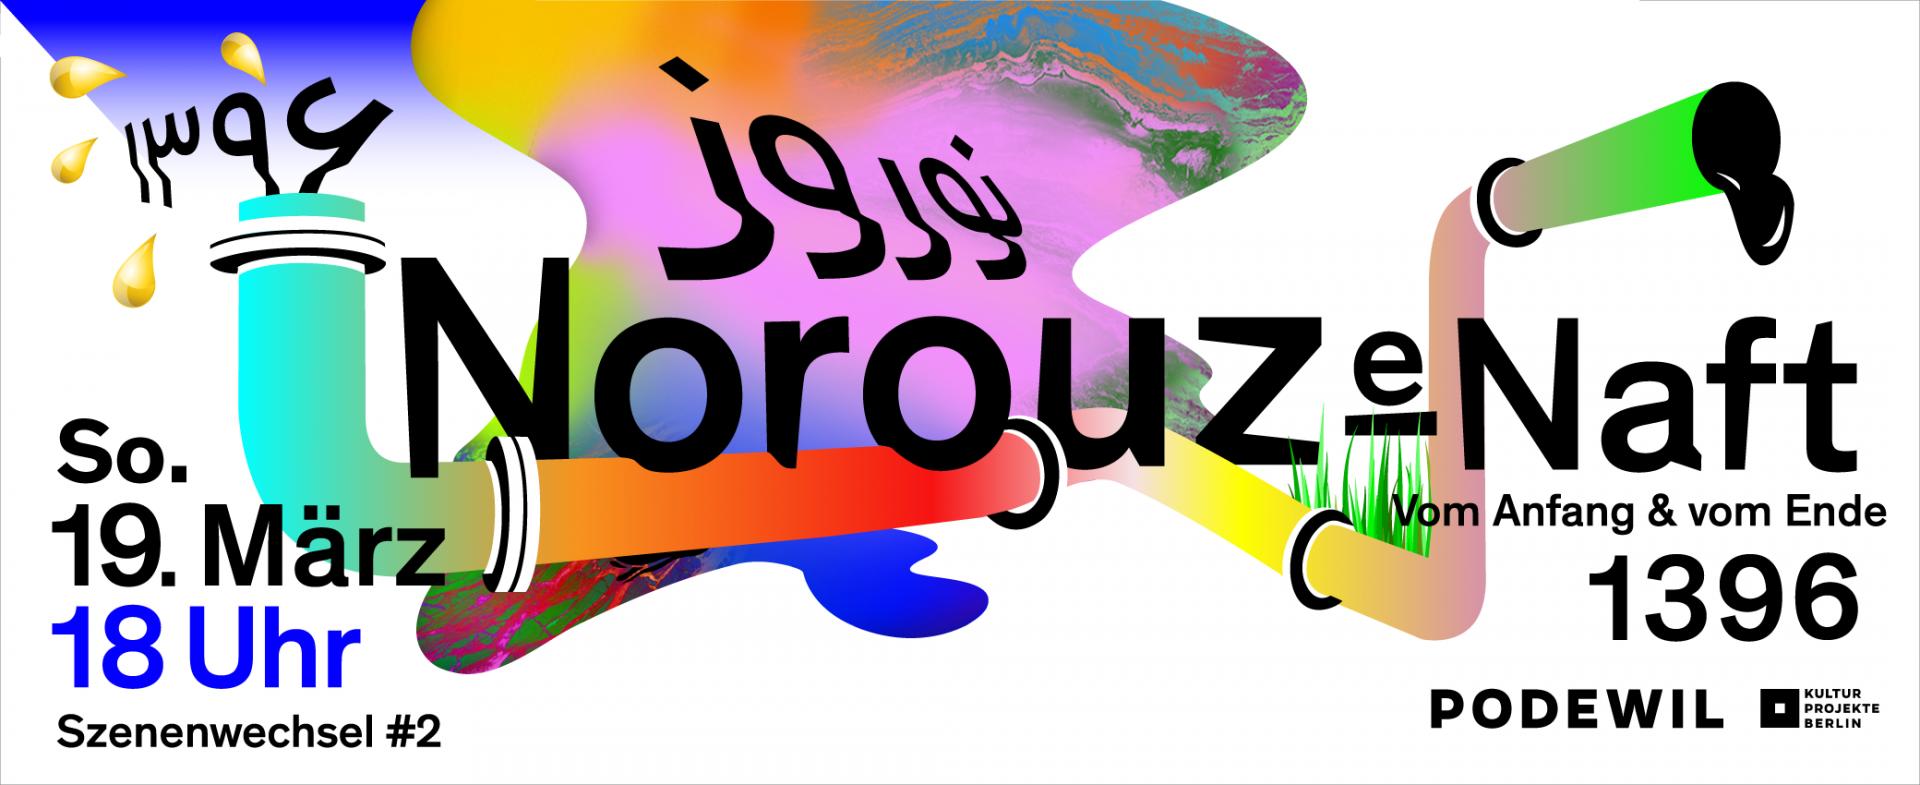 Studio Kat Rahmani نوروزِ نفت Norouz-e Naft